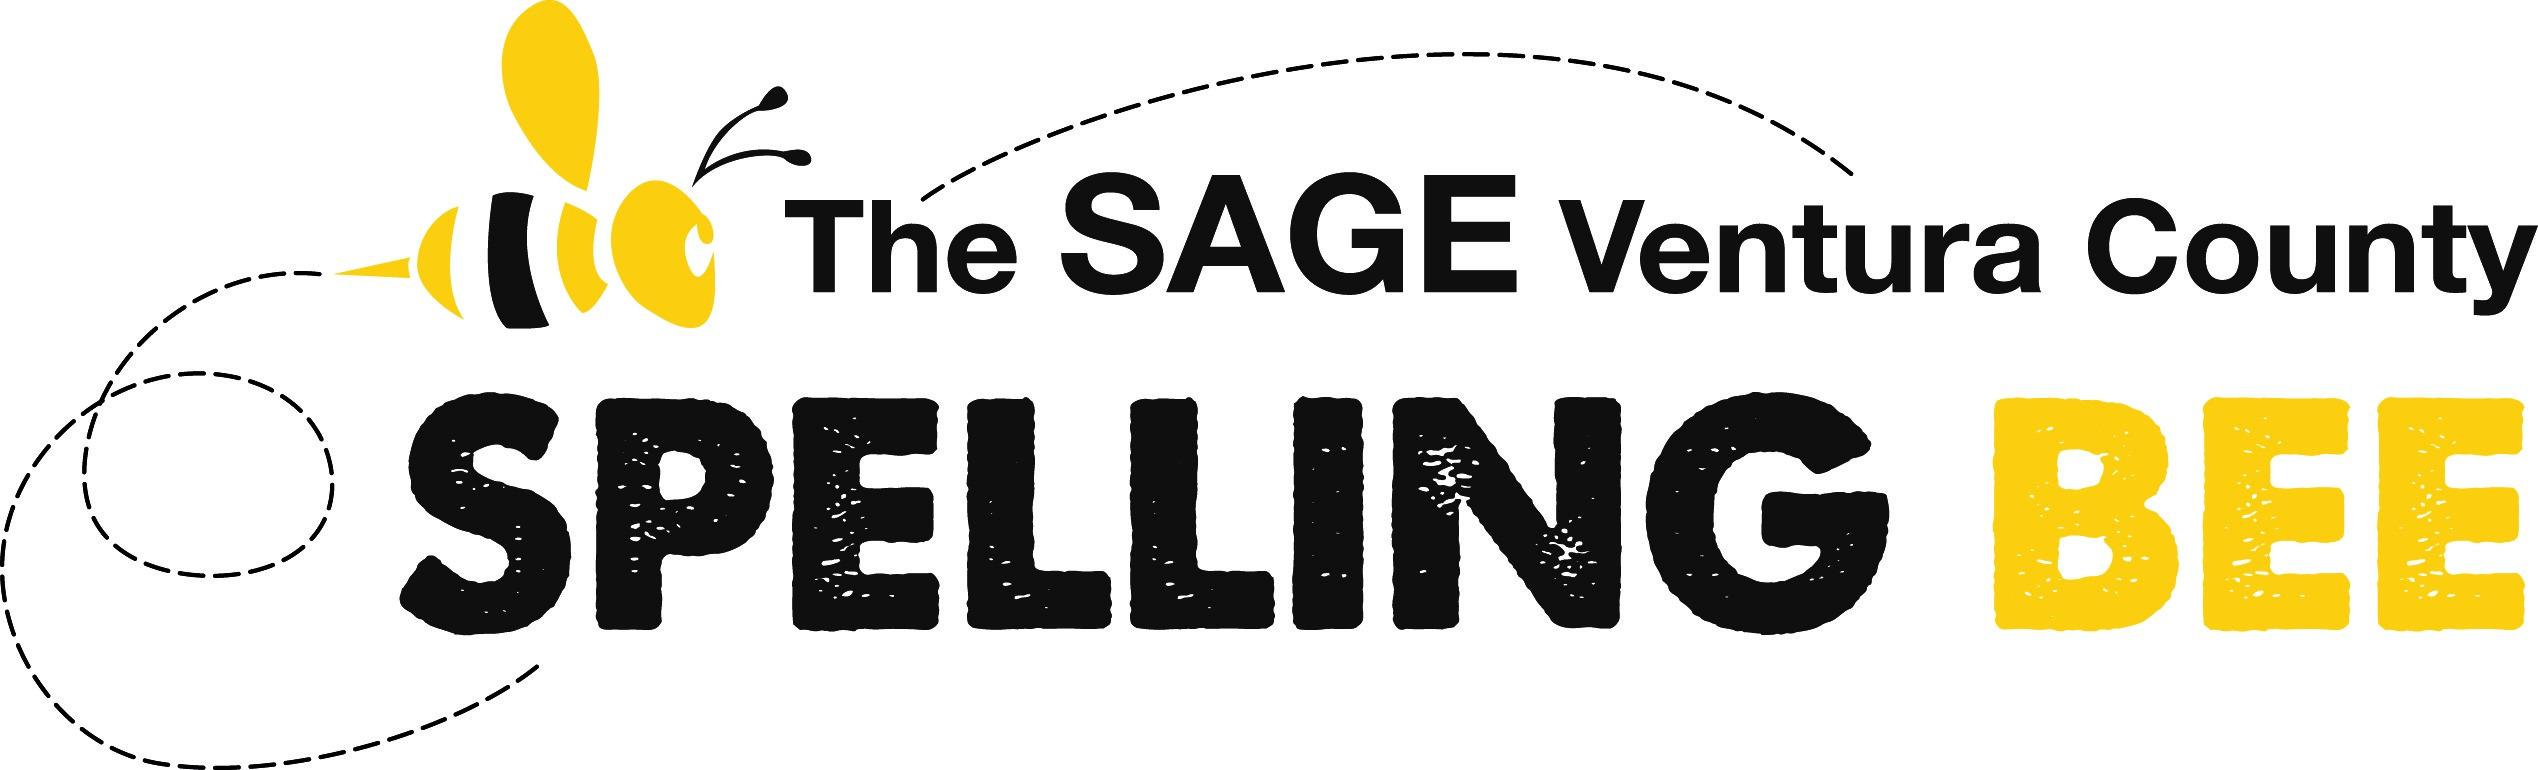 The SAGE Ventura County Spelling Bee logo